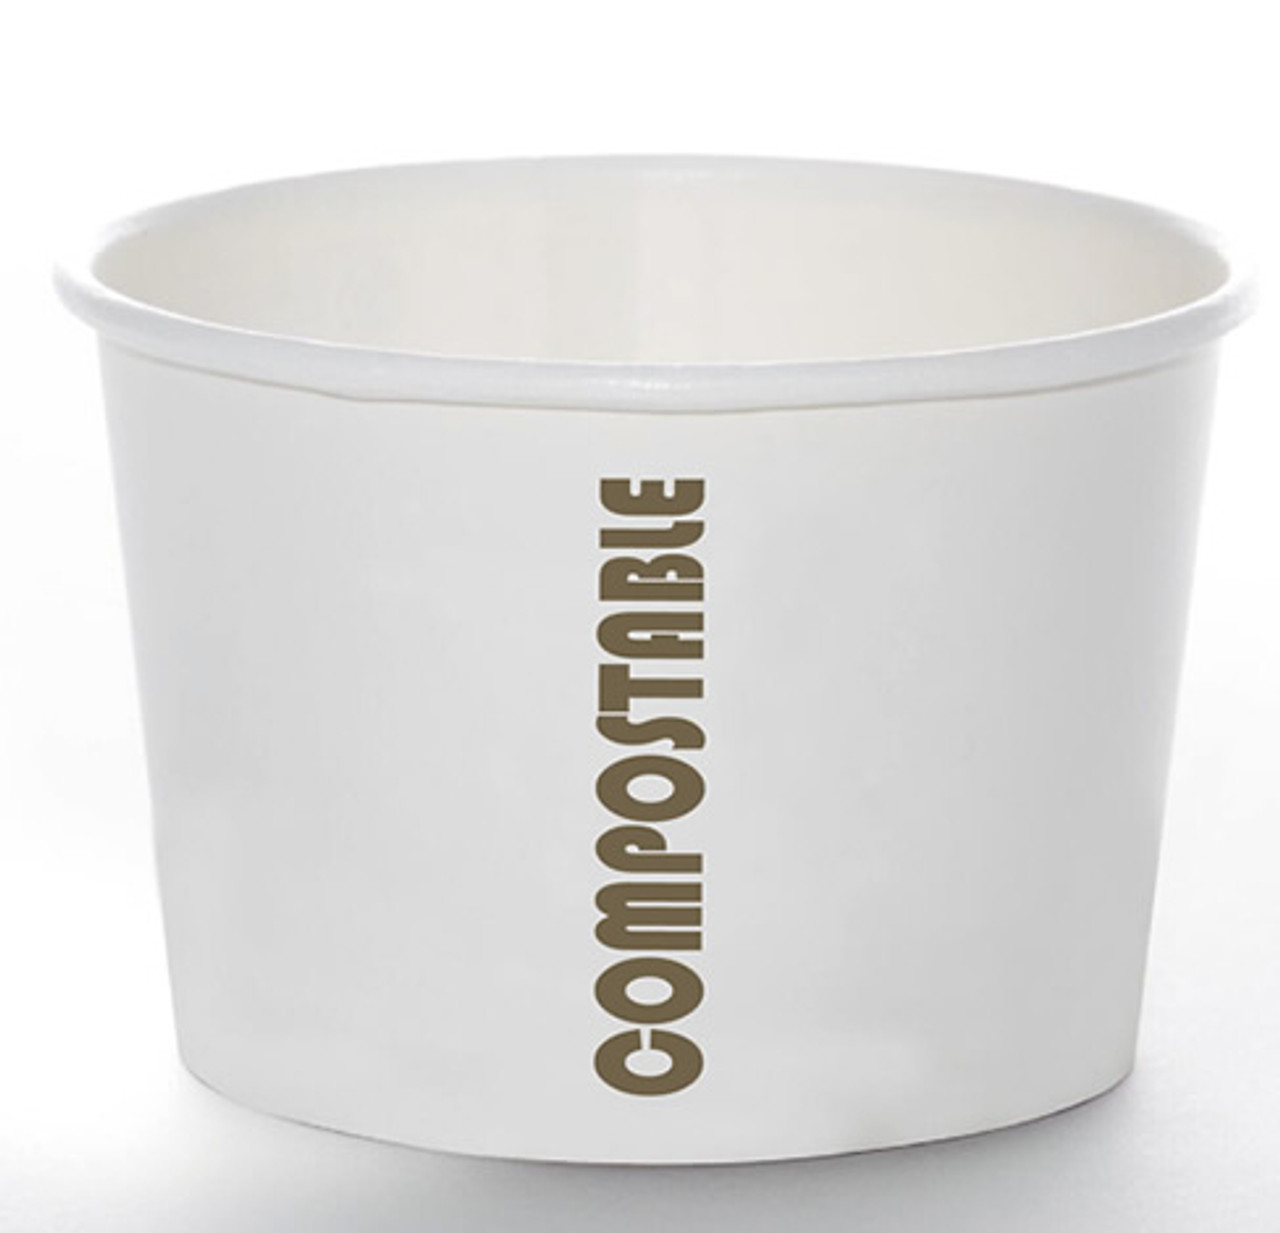 16oz Soup Cup Compostable Print™ Series